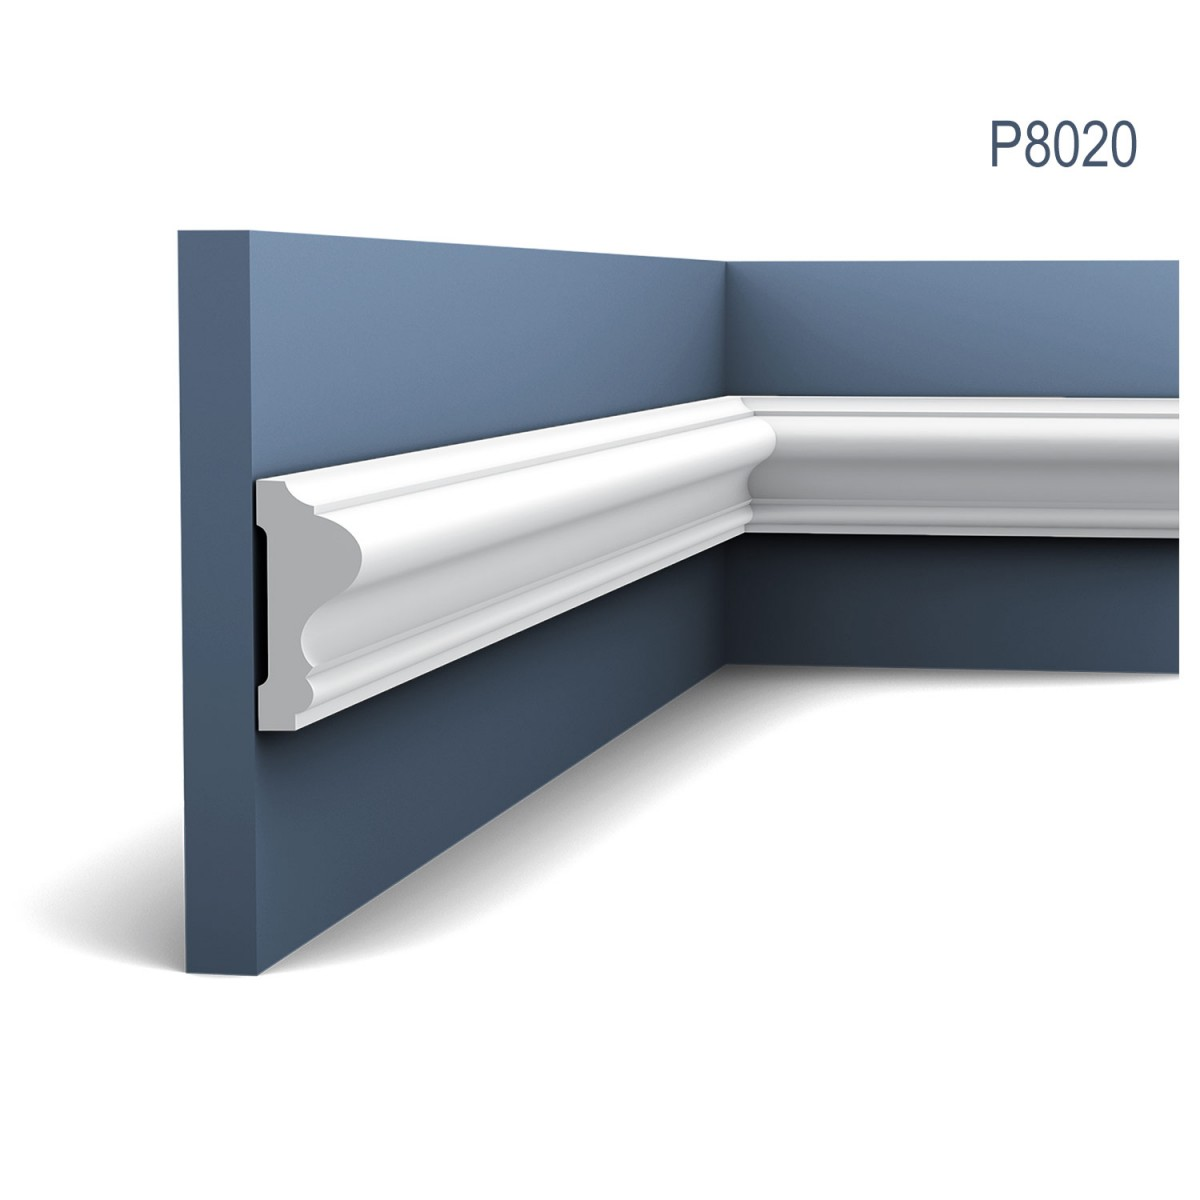 Brau Luxxus P8020, Dimensiuni: 200 X 6 X 2.6 cm, Orac Decor